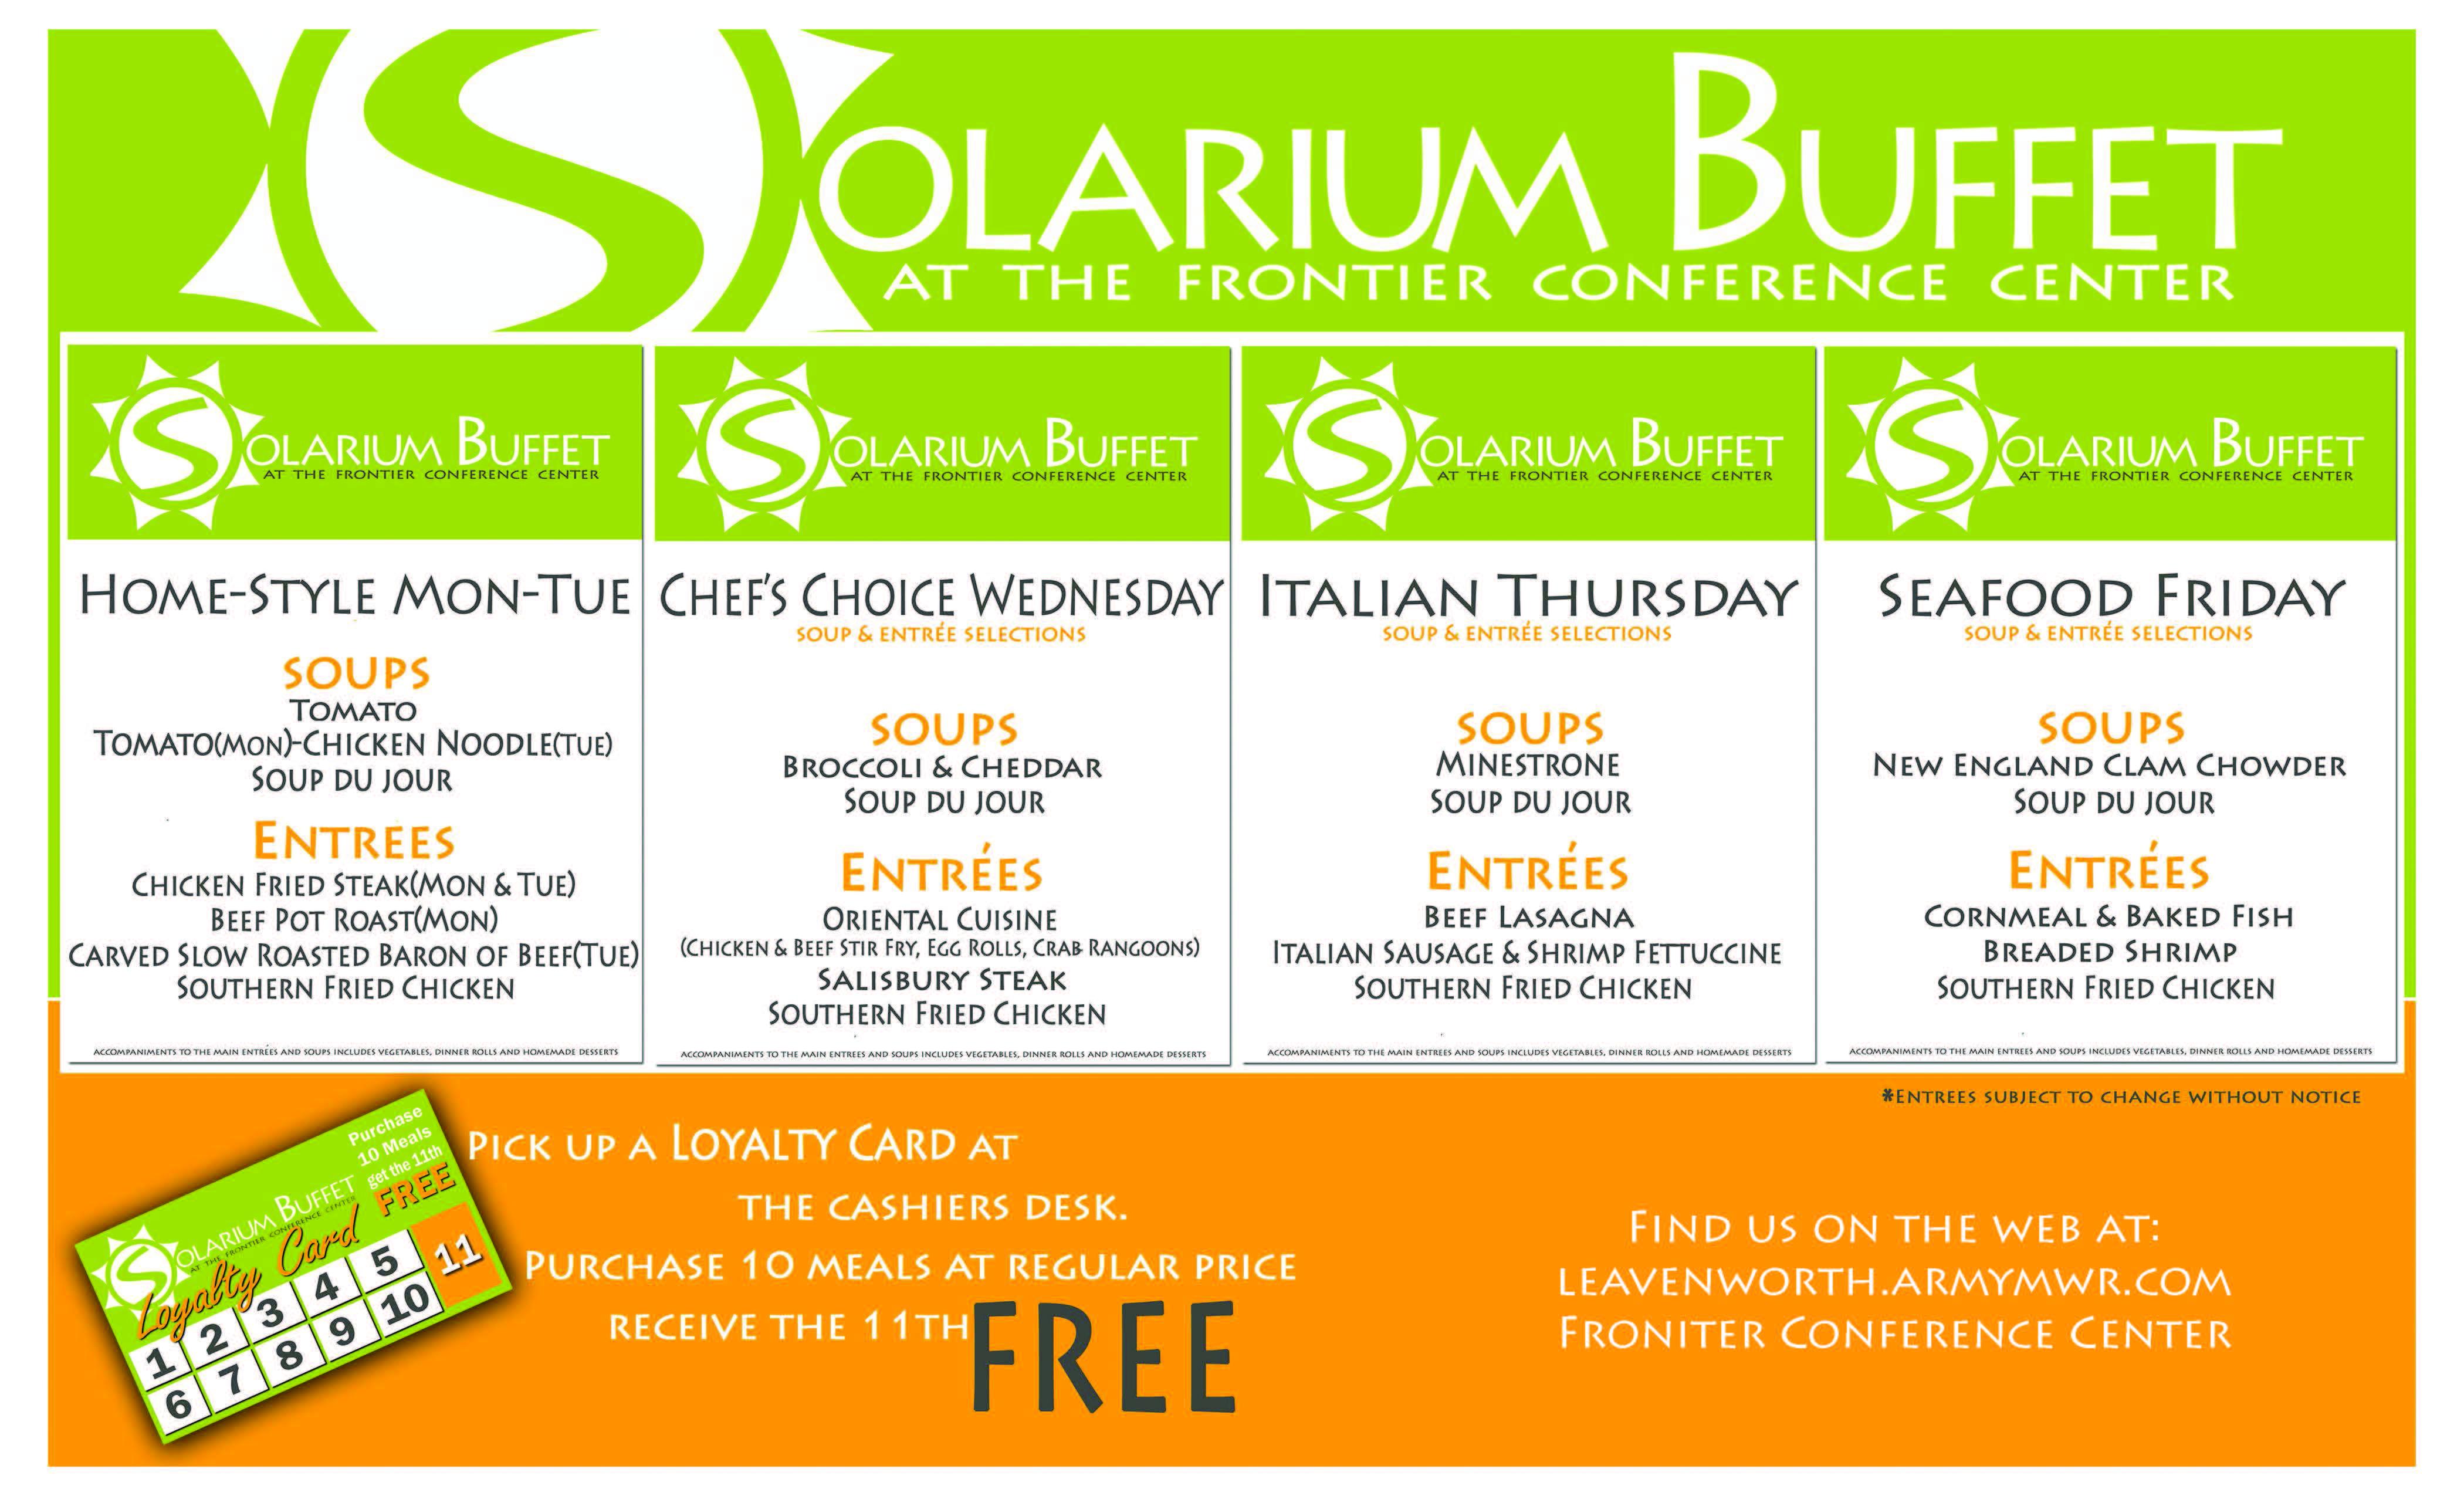 Solarium Buffet Trifold PDF_Page_2017.jpg